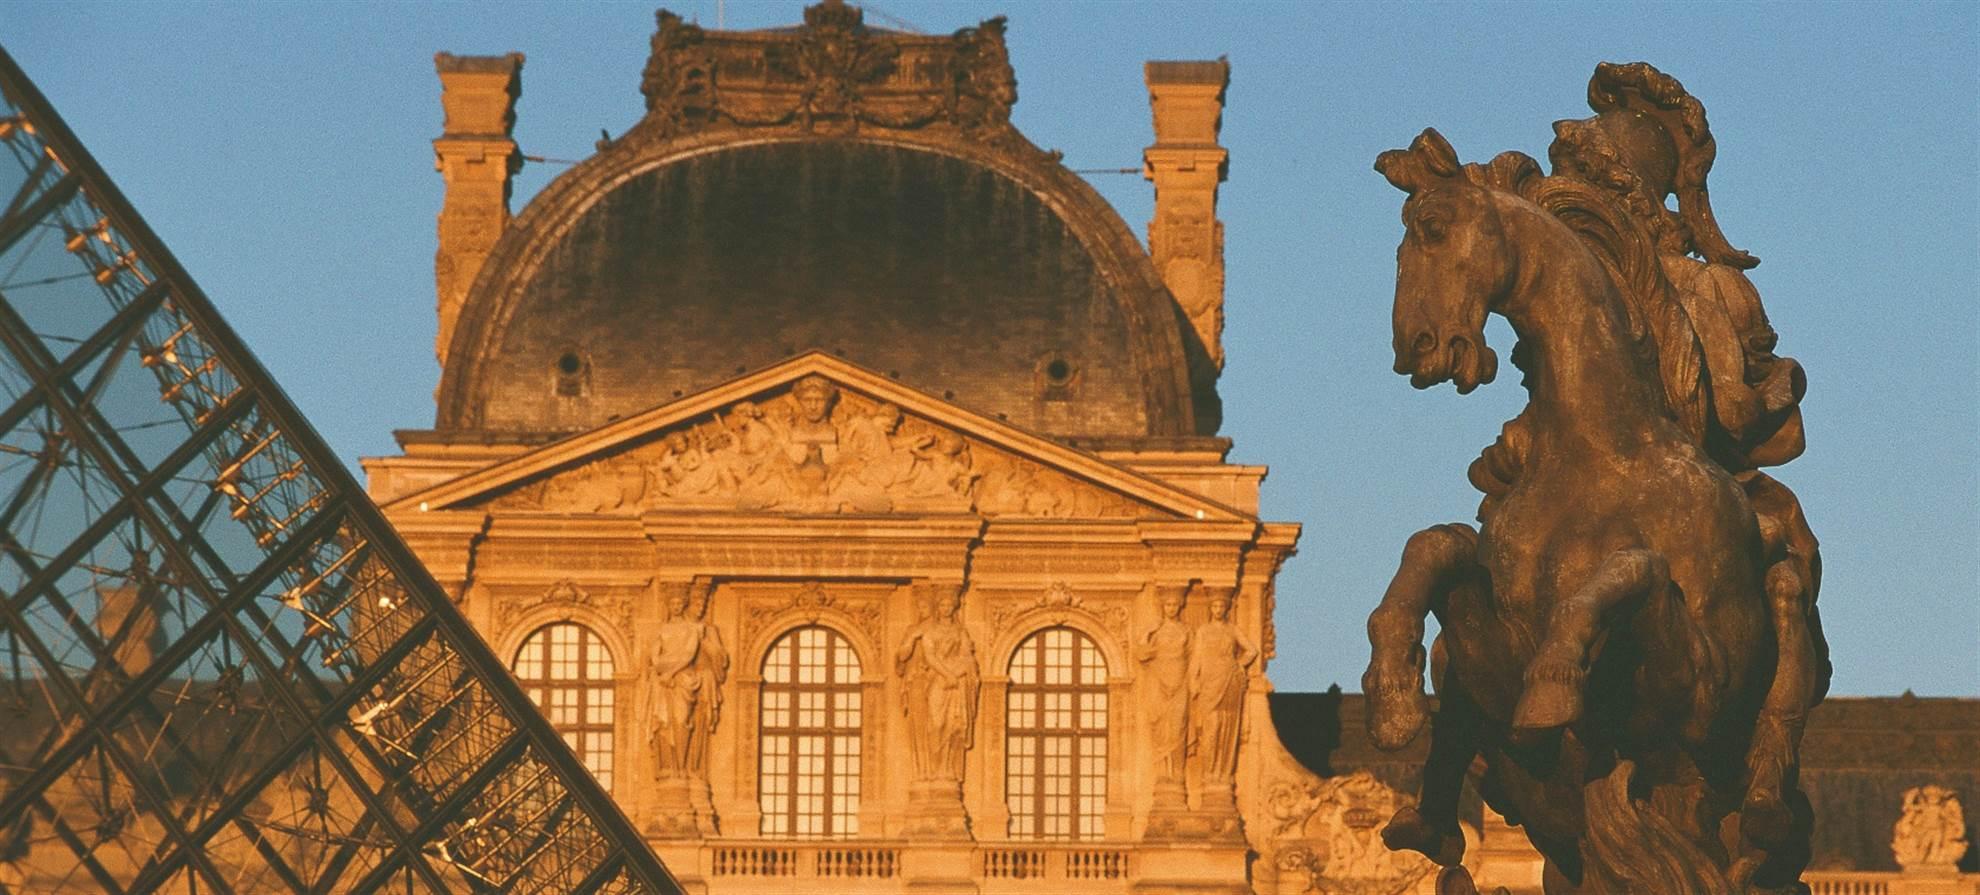 Paris Museum Pass (incluyendo 50 museos y monumentos)